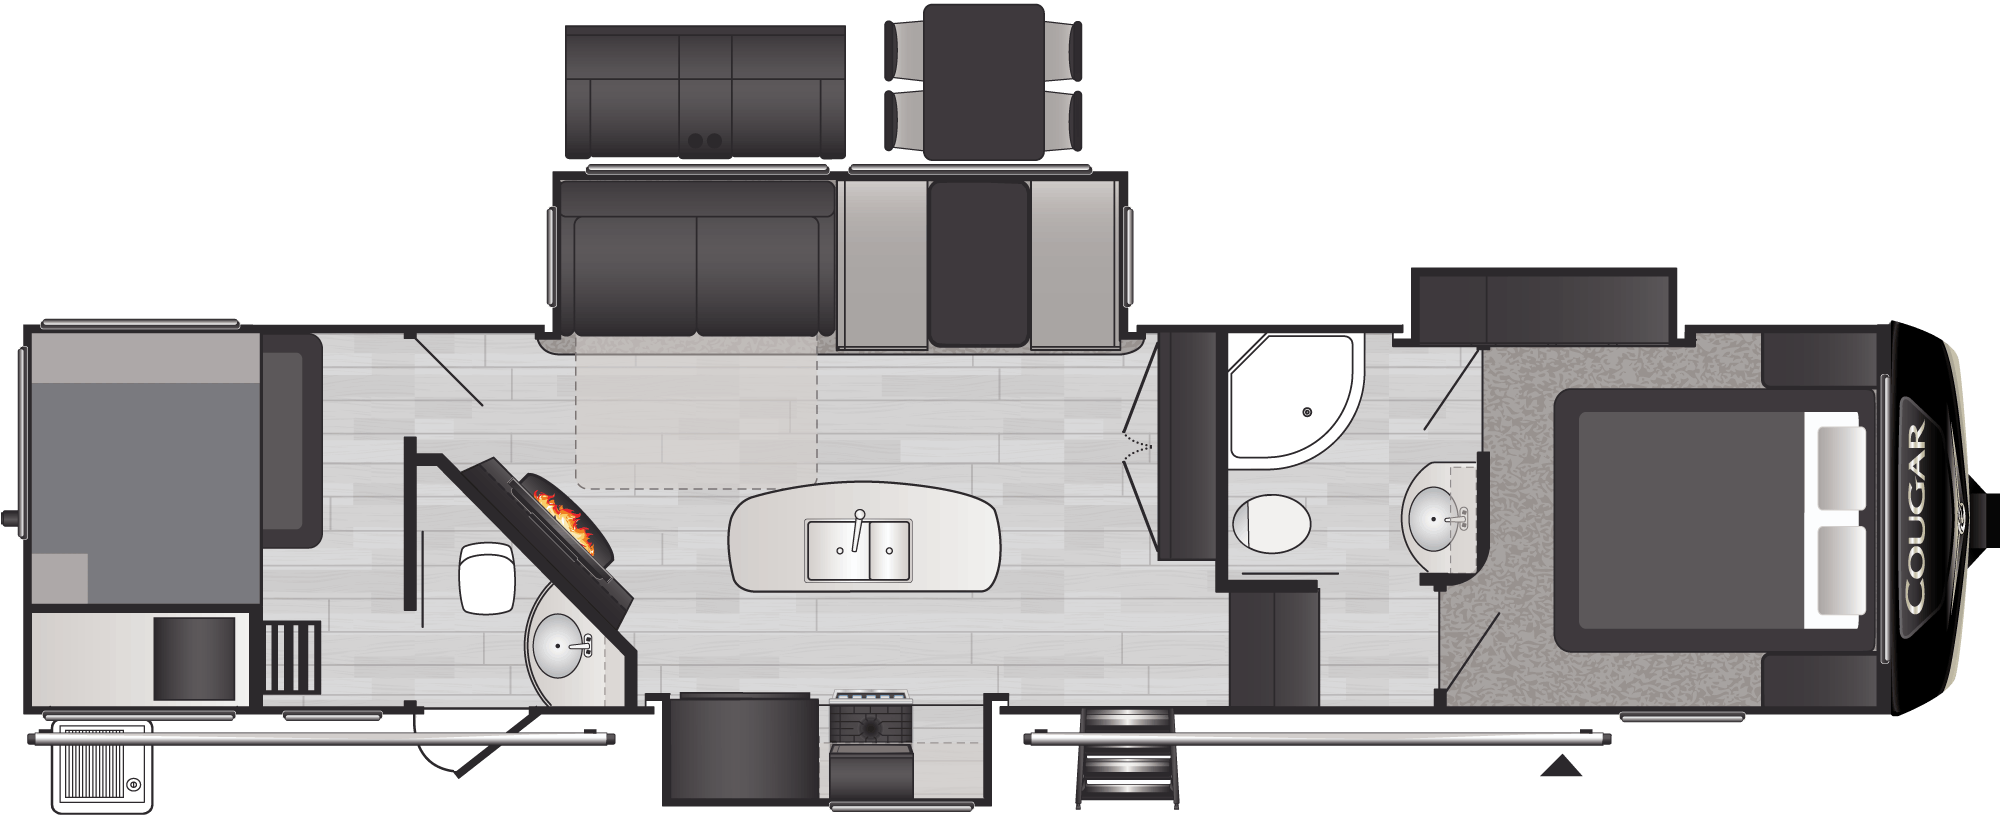 Floor plan: 2021 Cougar 364BHL